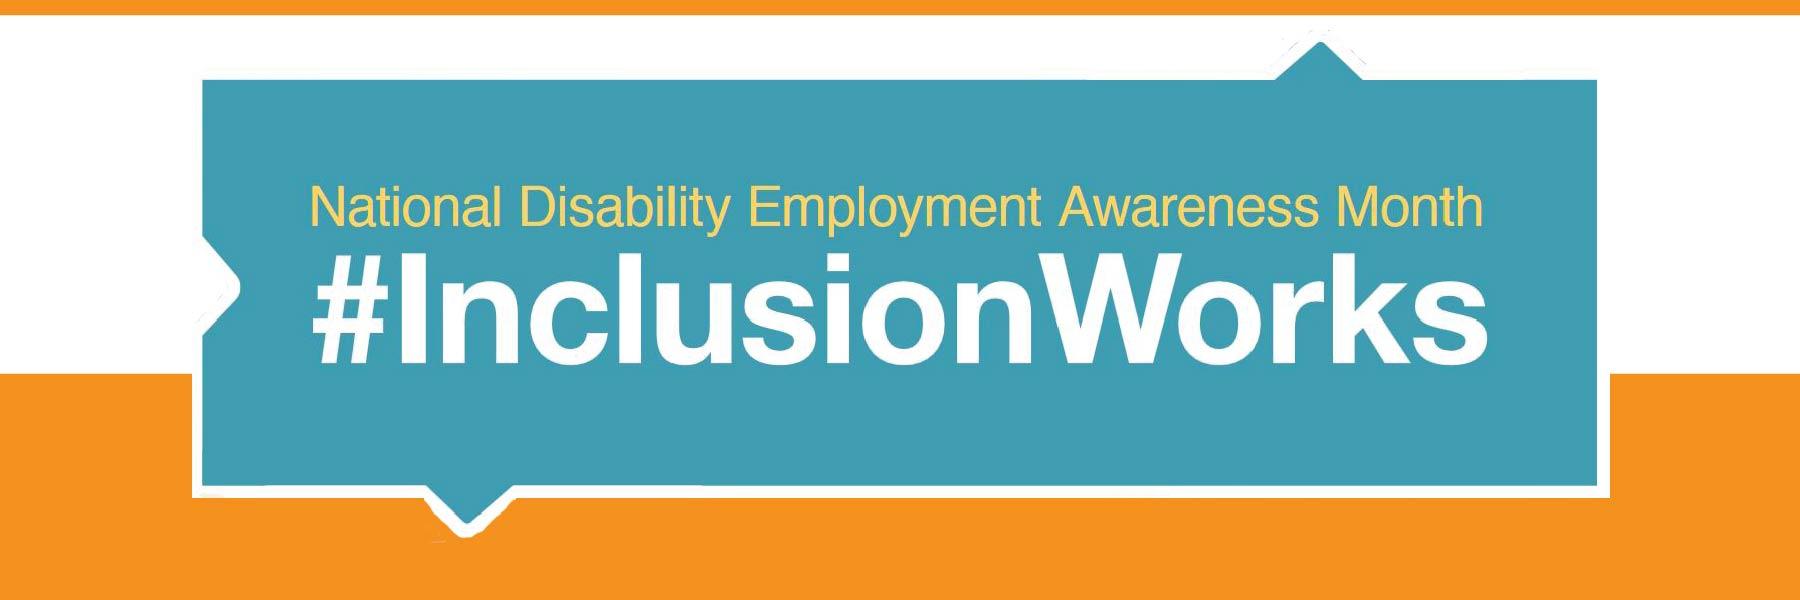 #InclusionWorks